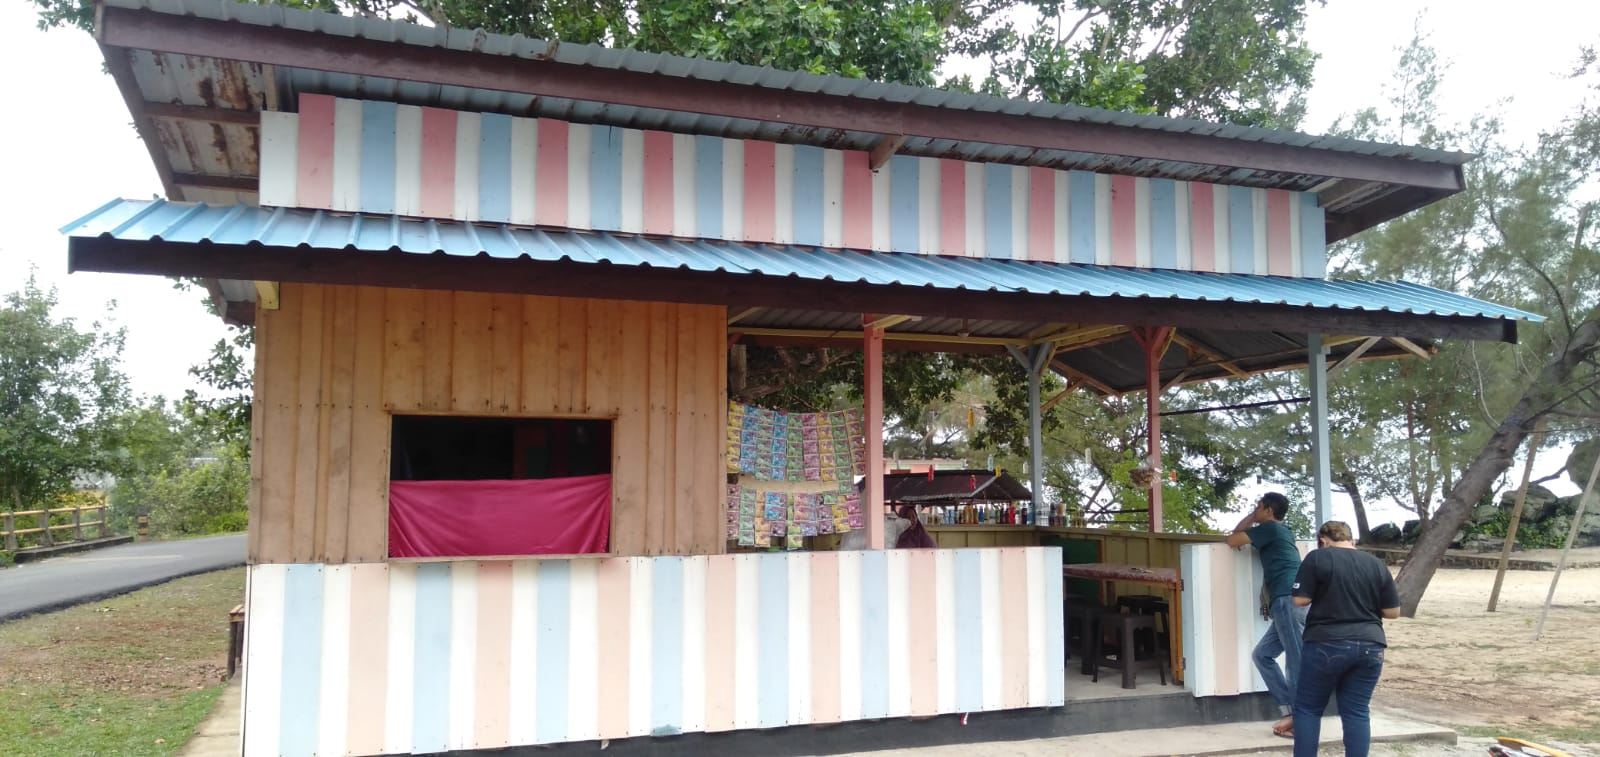 Foto Warung Di Tempat Wisata Batu Berdaun Kabupaten Lingga Yang Dibobol Oleh Maling